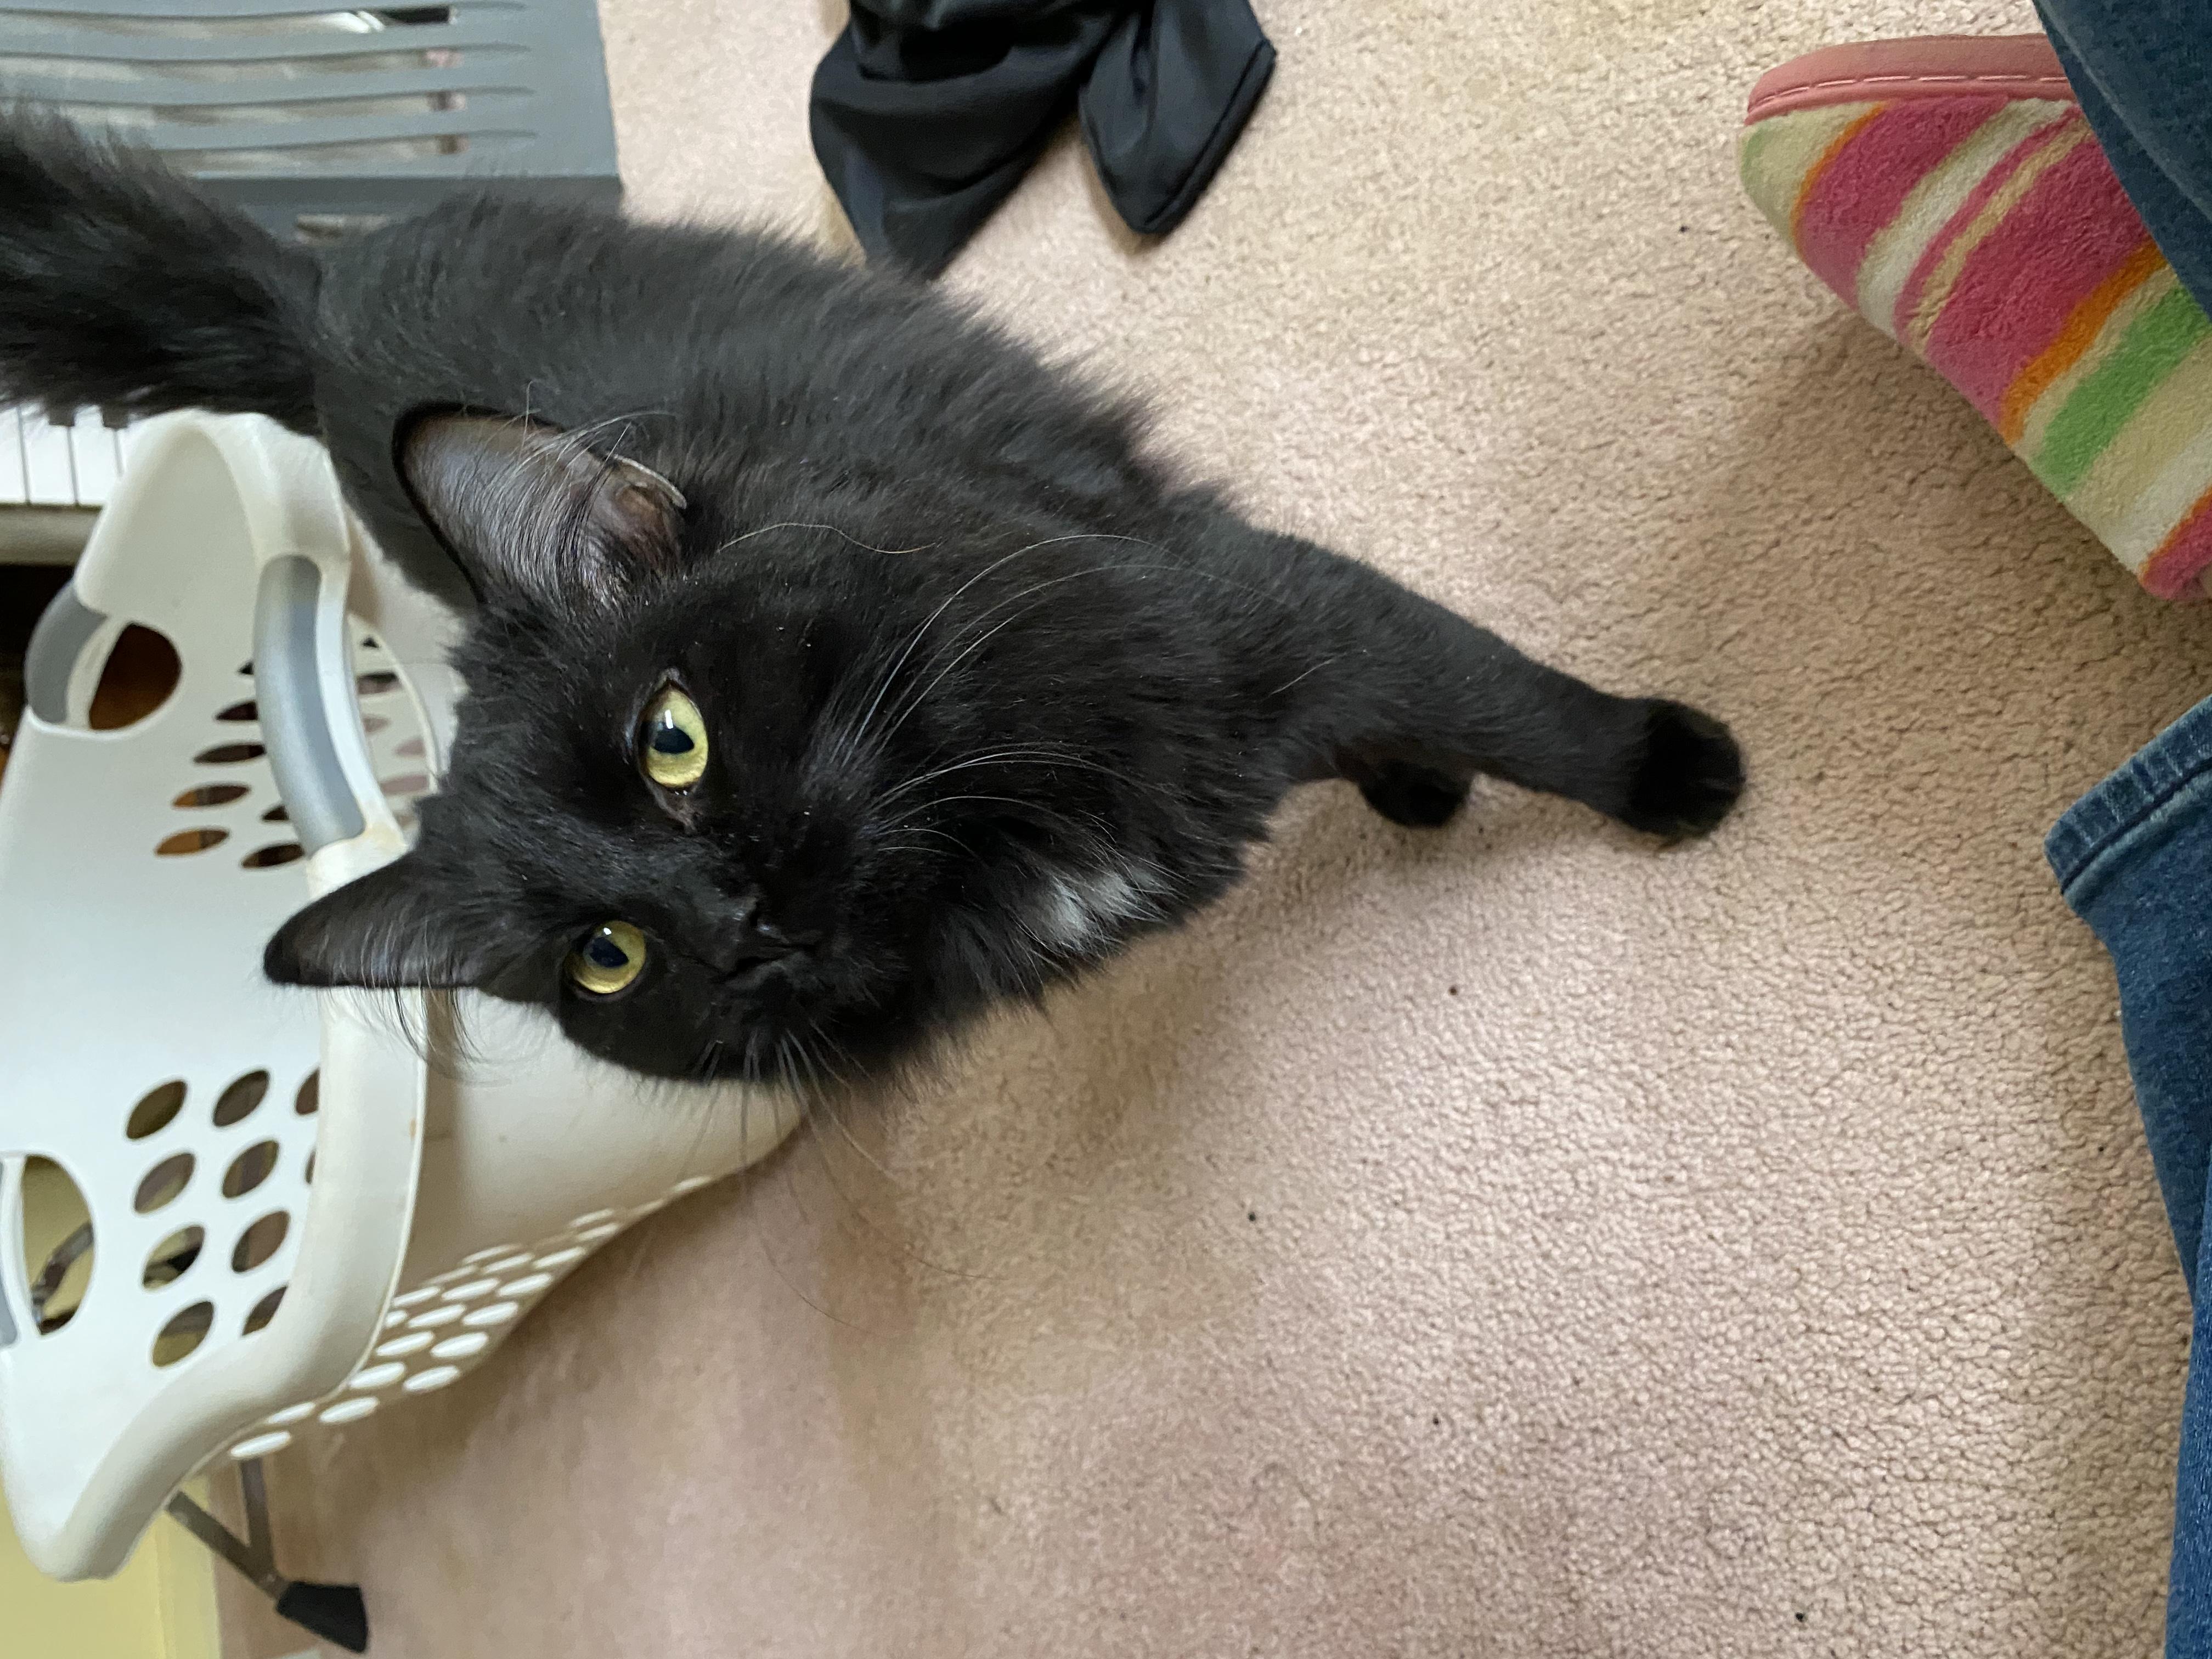 adoptable Cat in Charles Town,WV named Sabrina